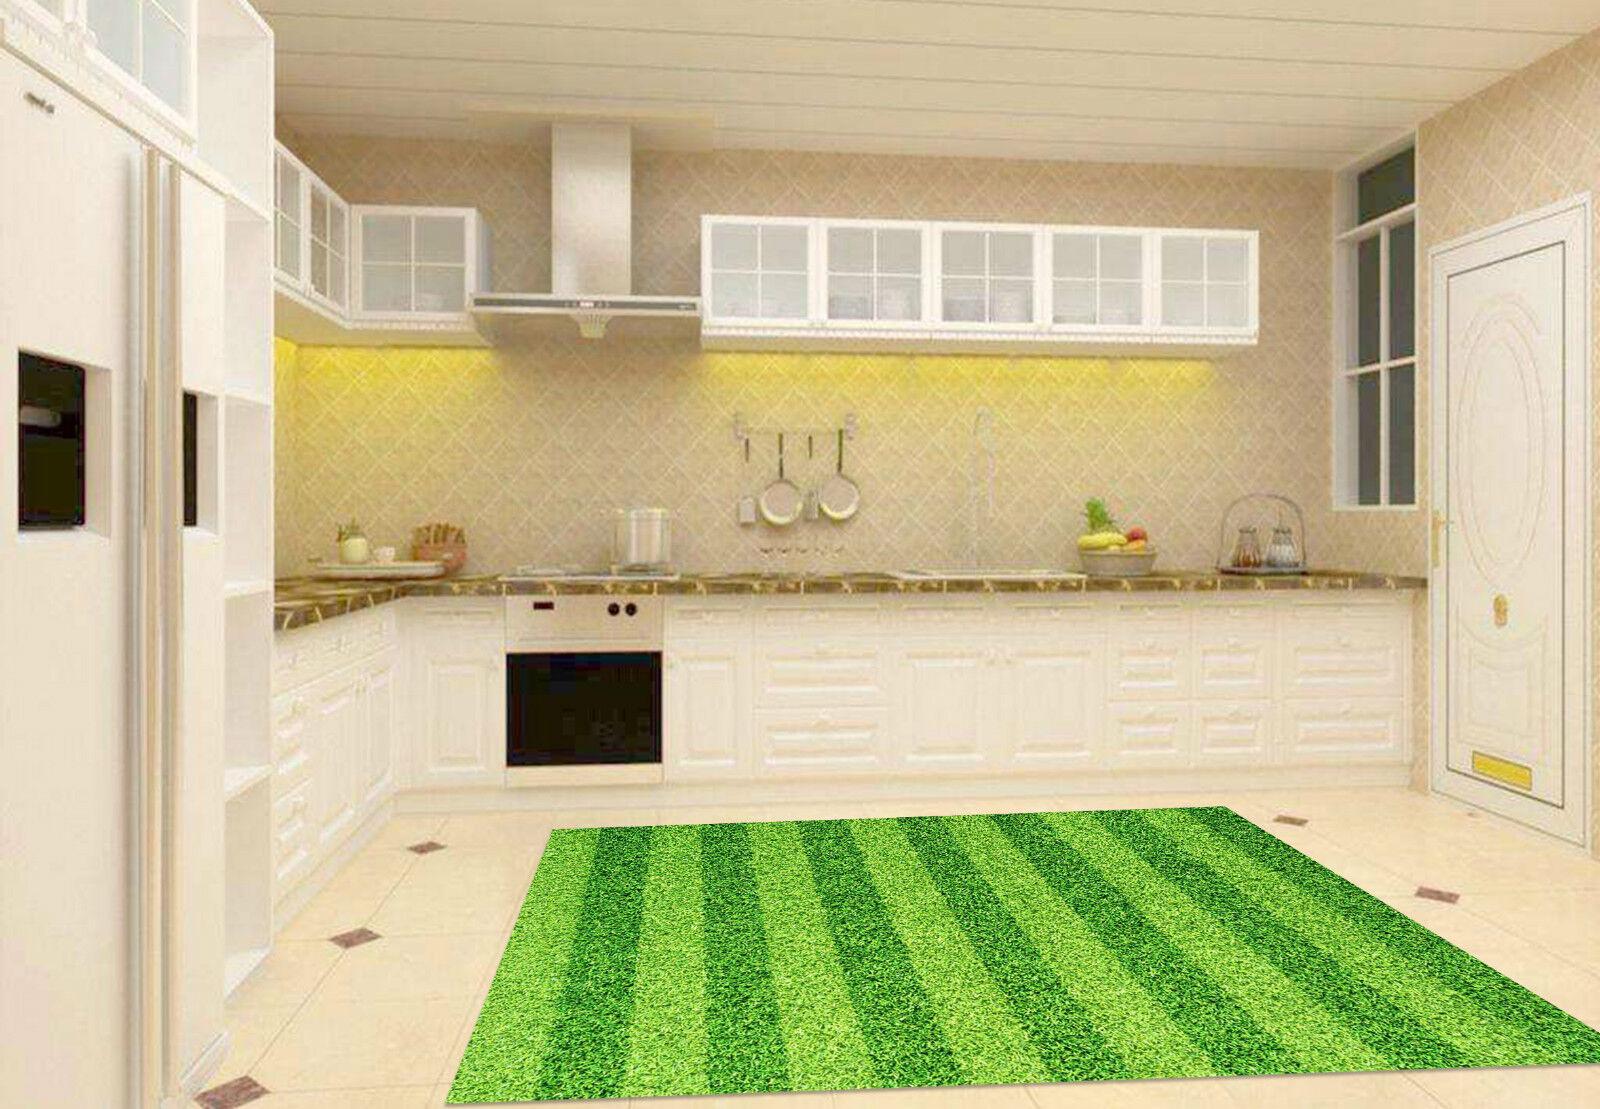 3D Grass Stripes Kitchen Mat Floor Murals Wall Print Wall Deco AJ WALLPAPER CA